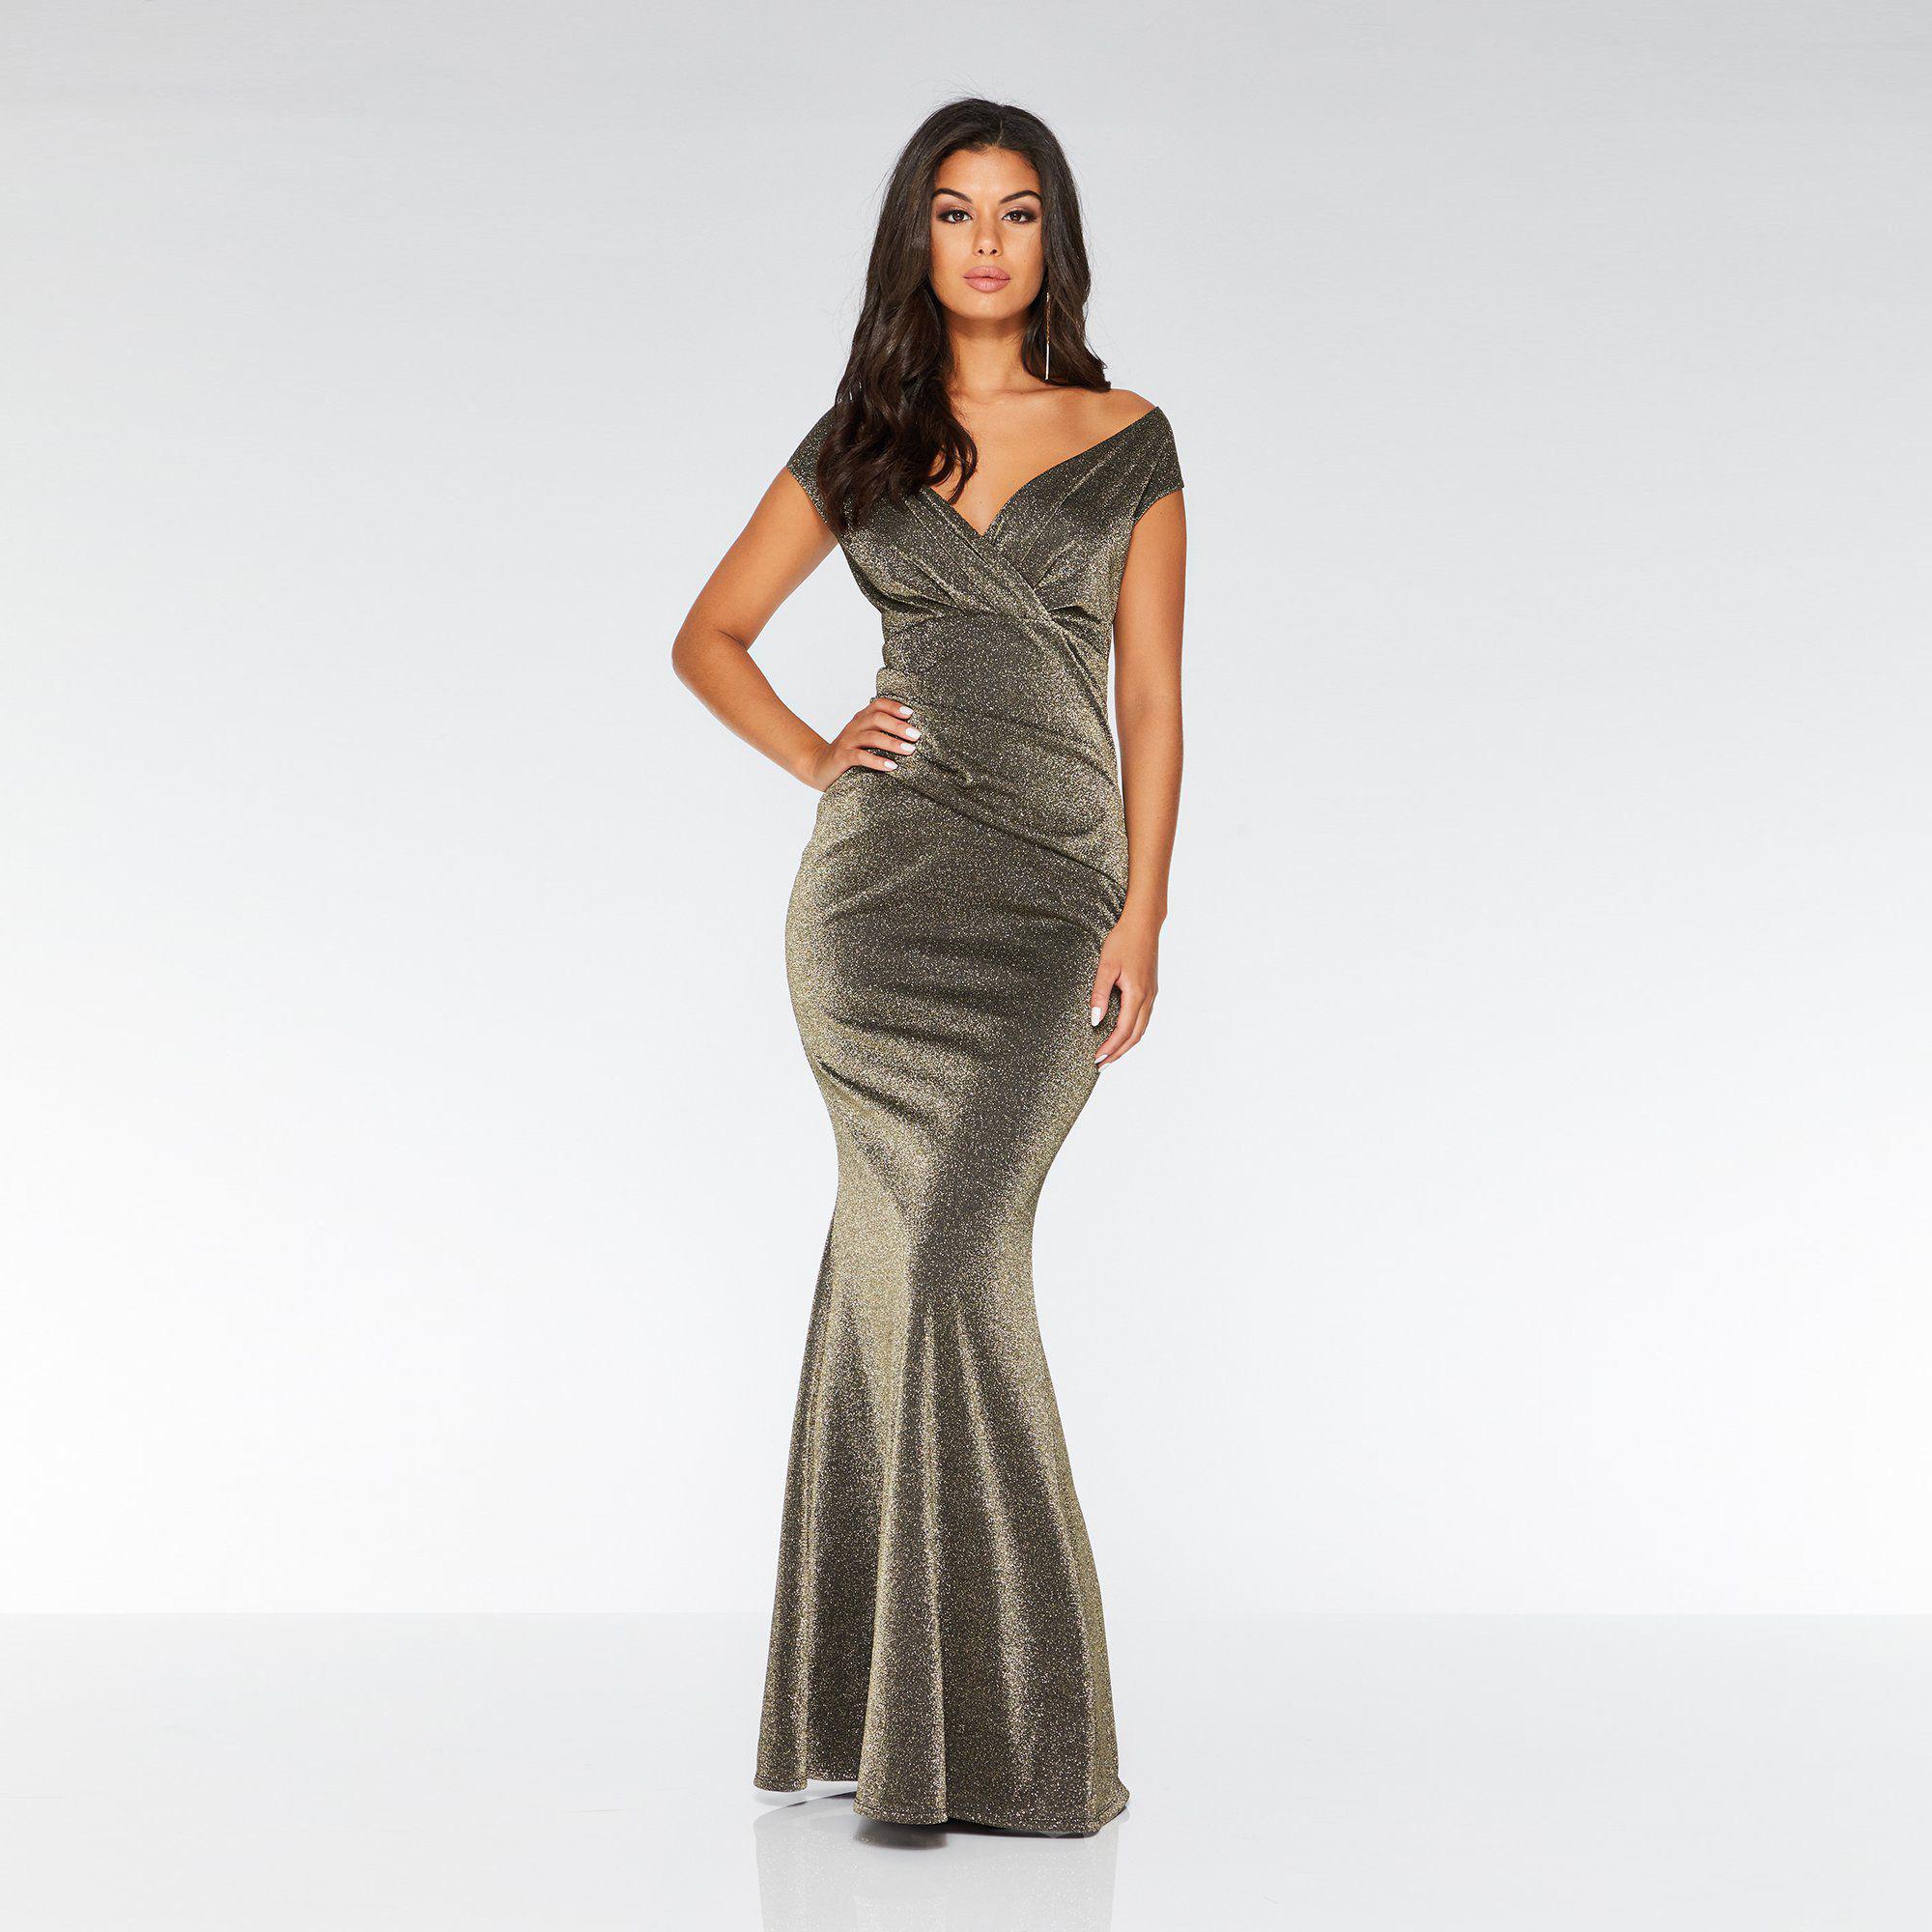 aa5b929a3e1c3 Quiz Gold And Black Glitter Lace Fishtail Maxi Dress - PostParc